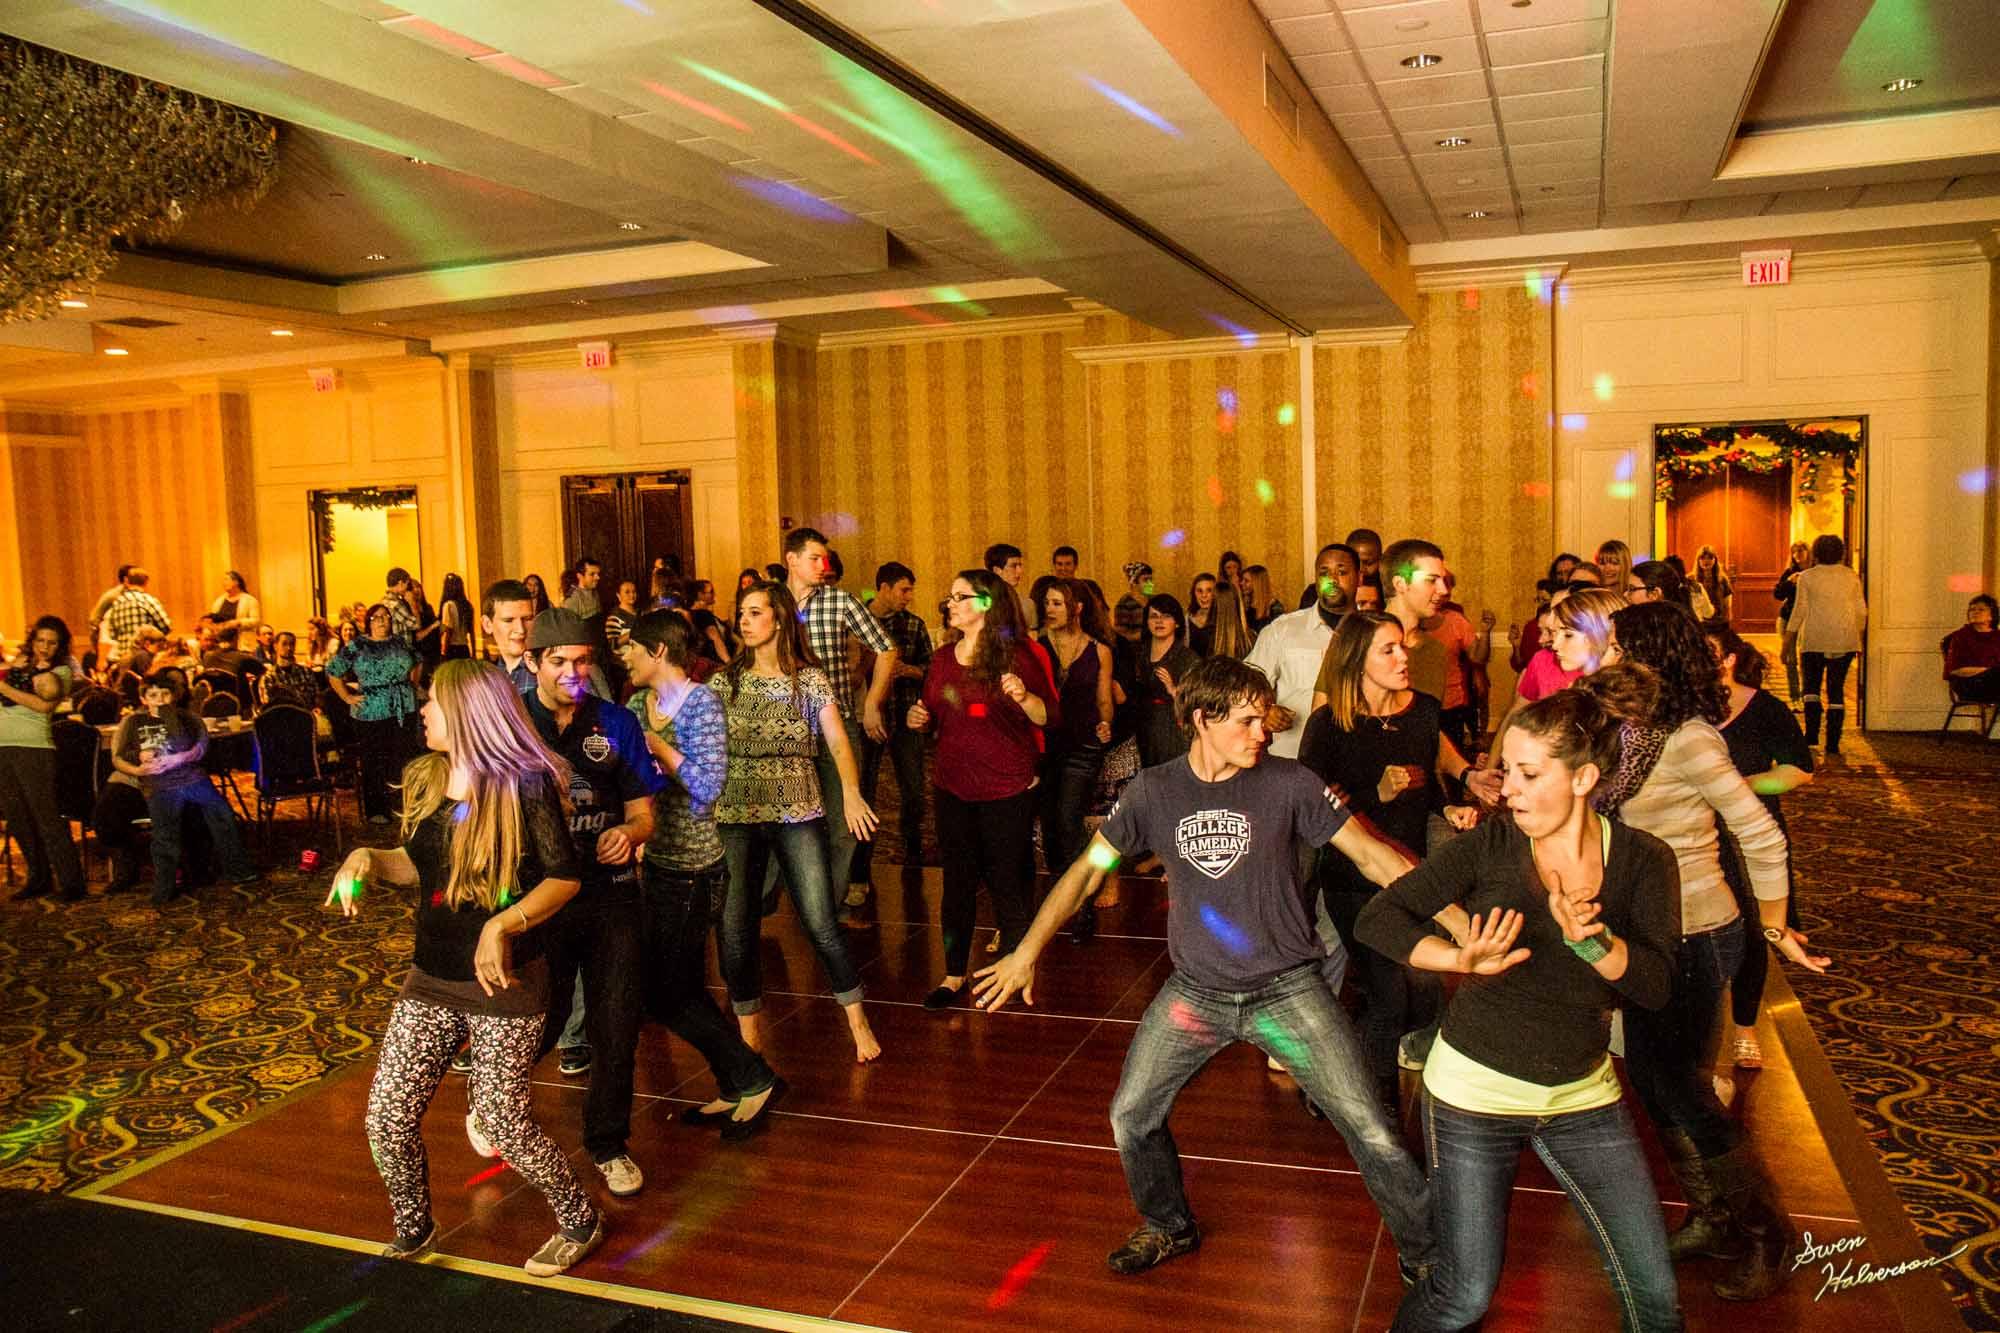 Theme:Dance | Title: Feelin' The Groove